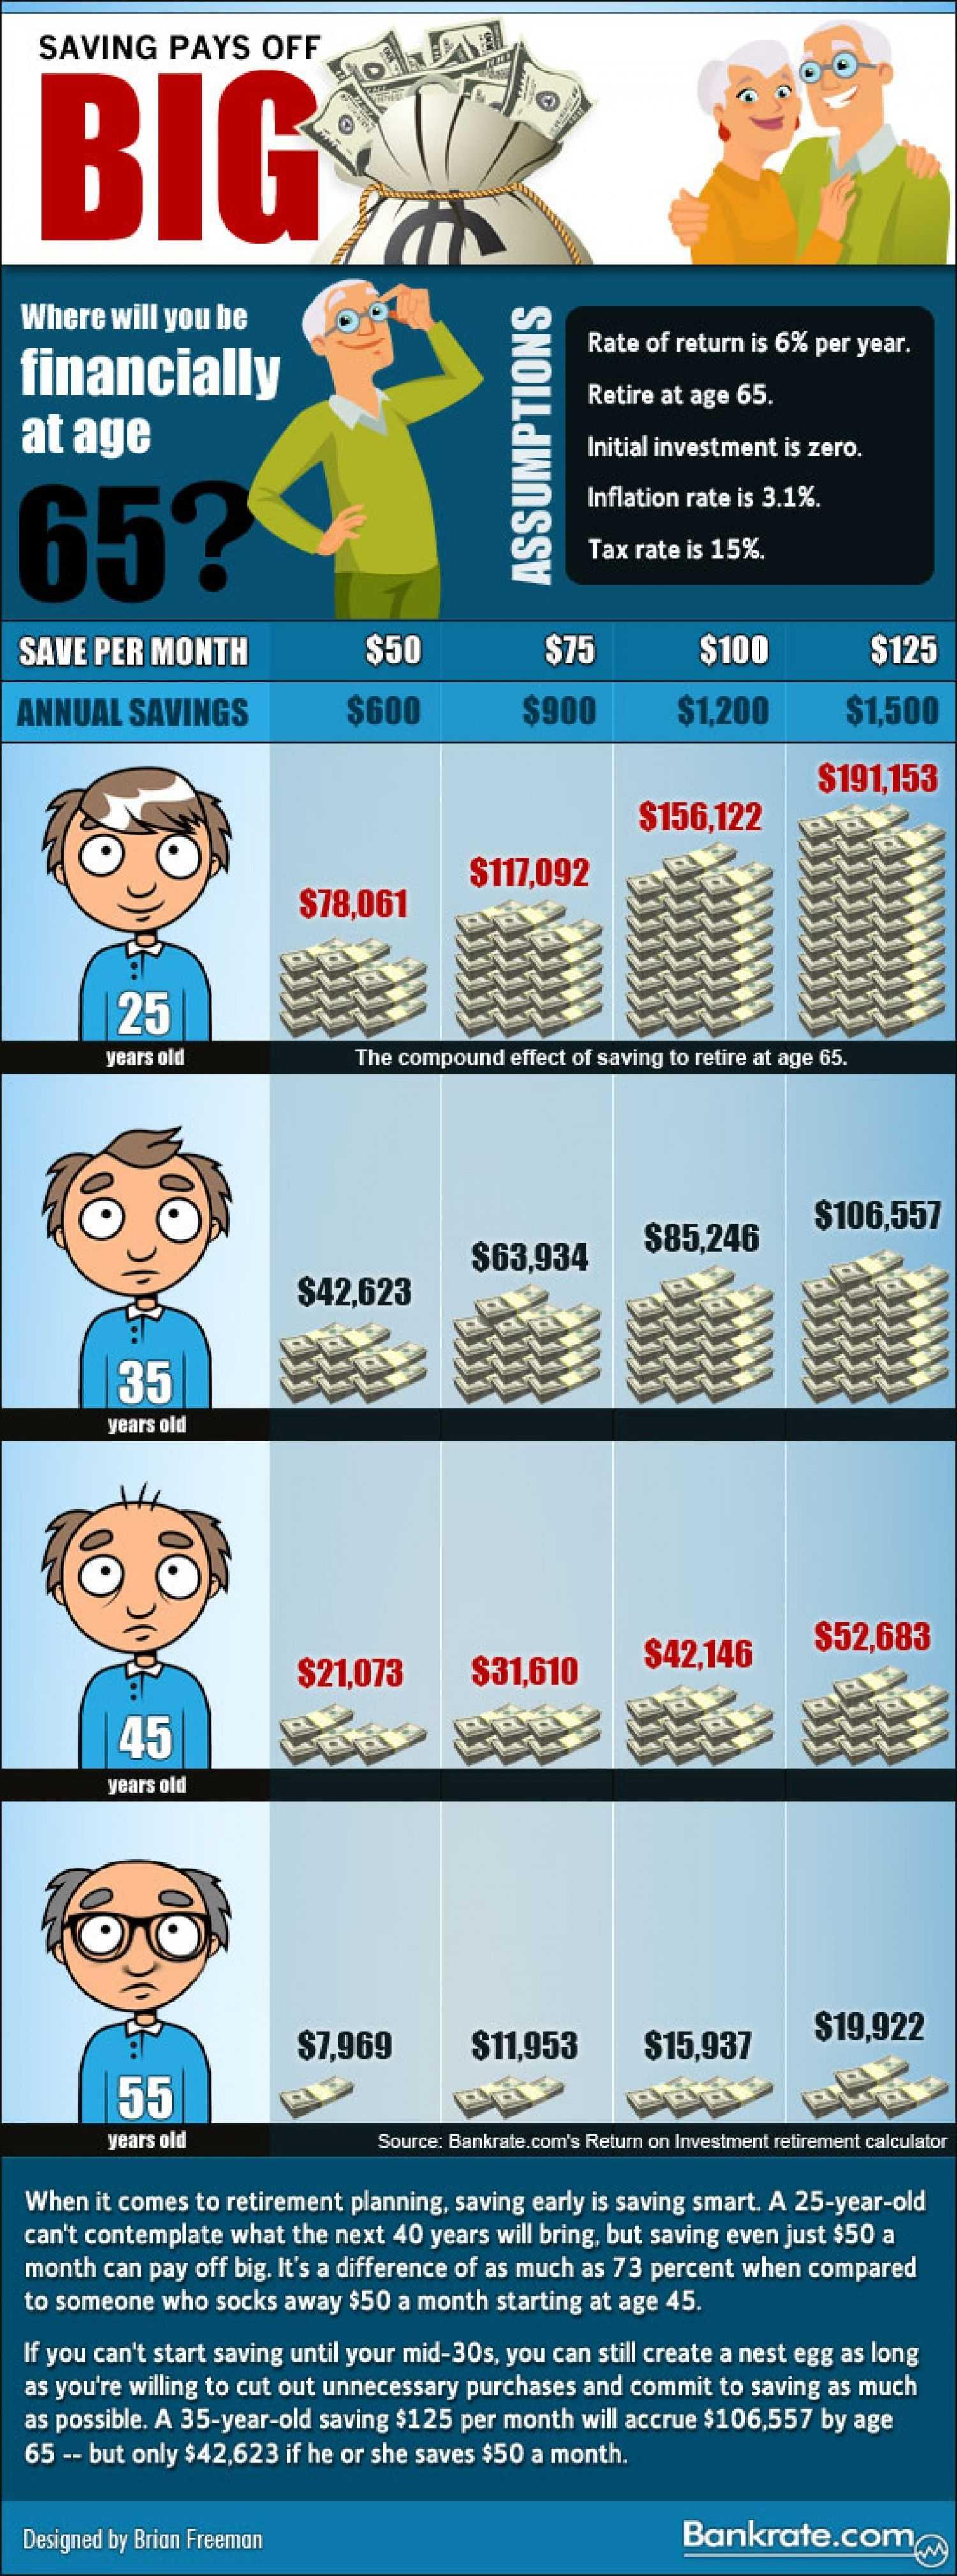 Saving Pays Off Big